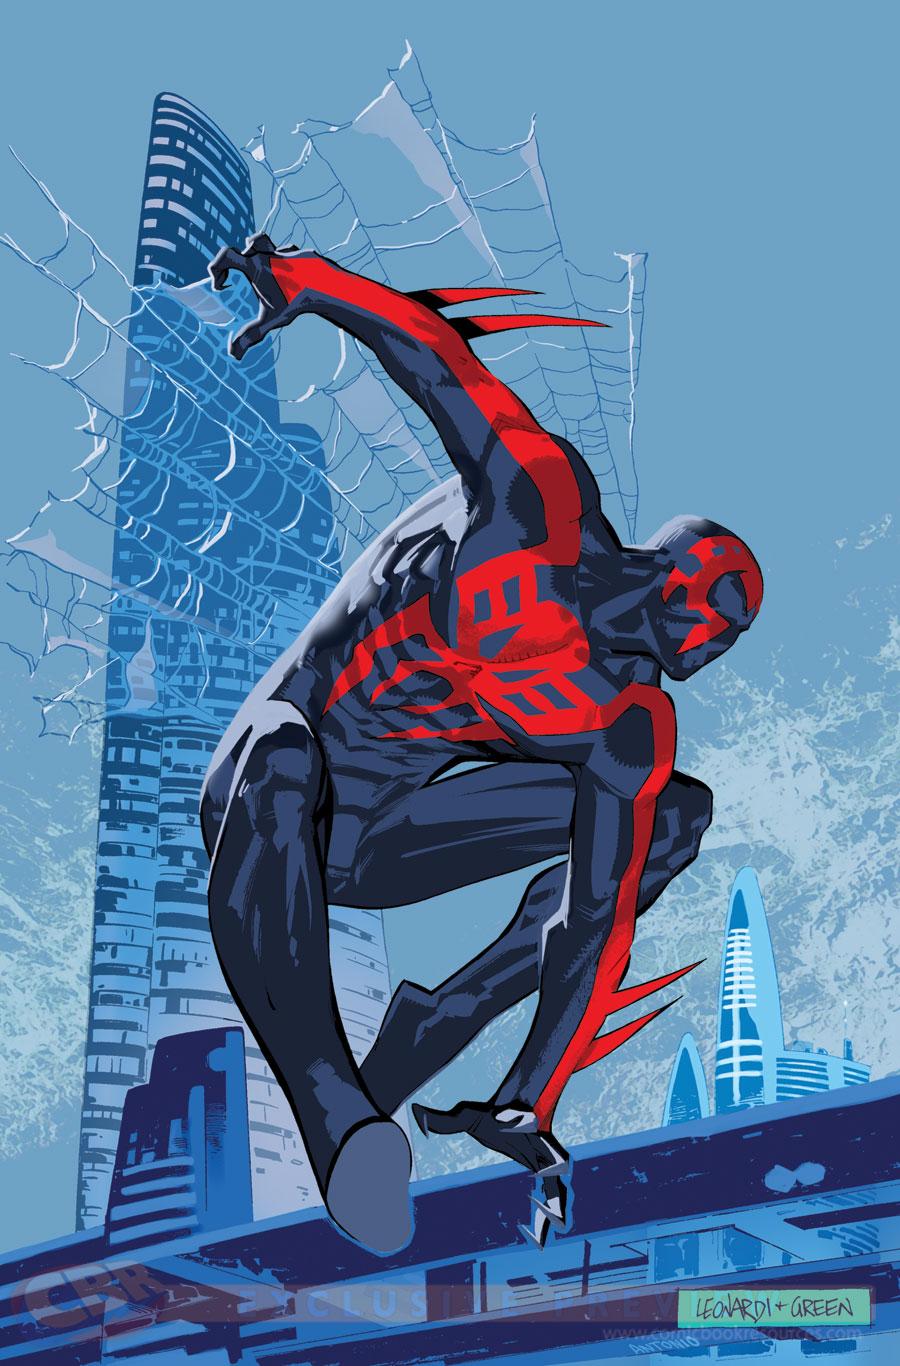 Spider-Man2099VariantLeonardi-232b6